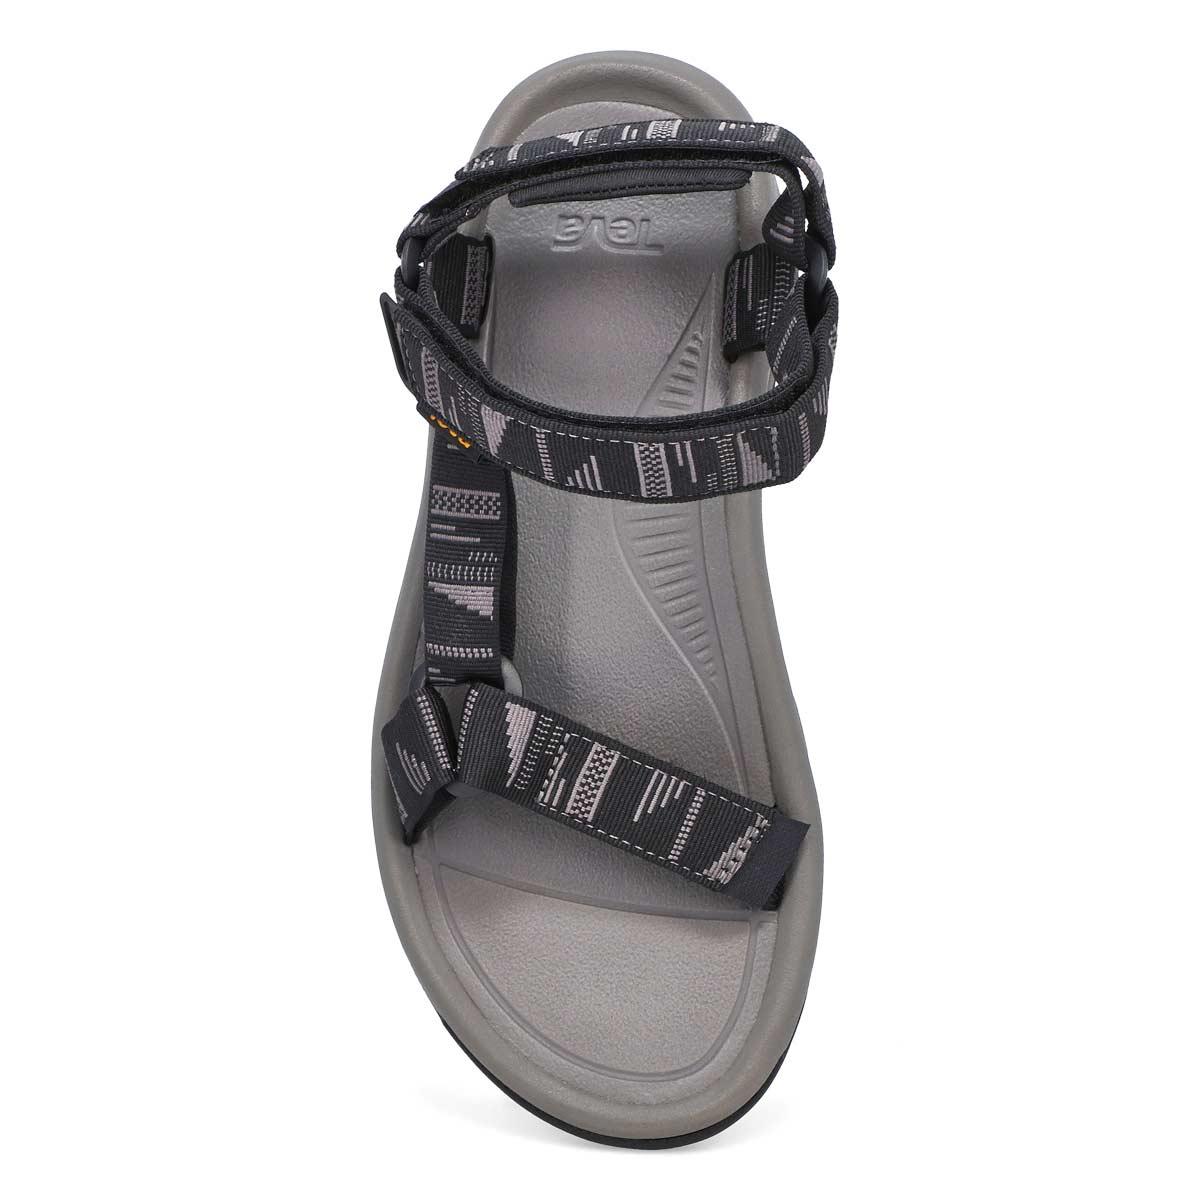 Mns Hurricane XLT2 blk/gry sport sandal